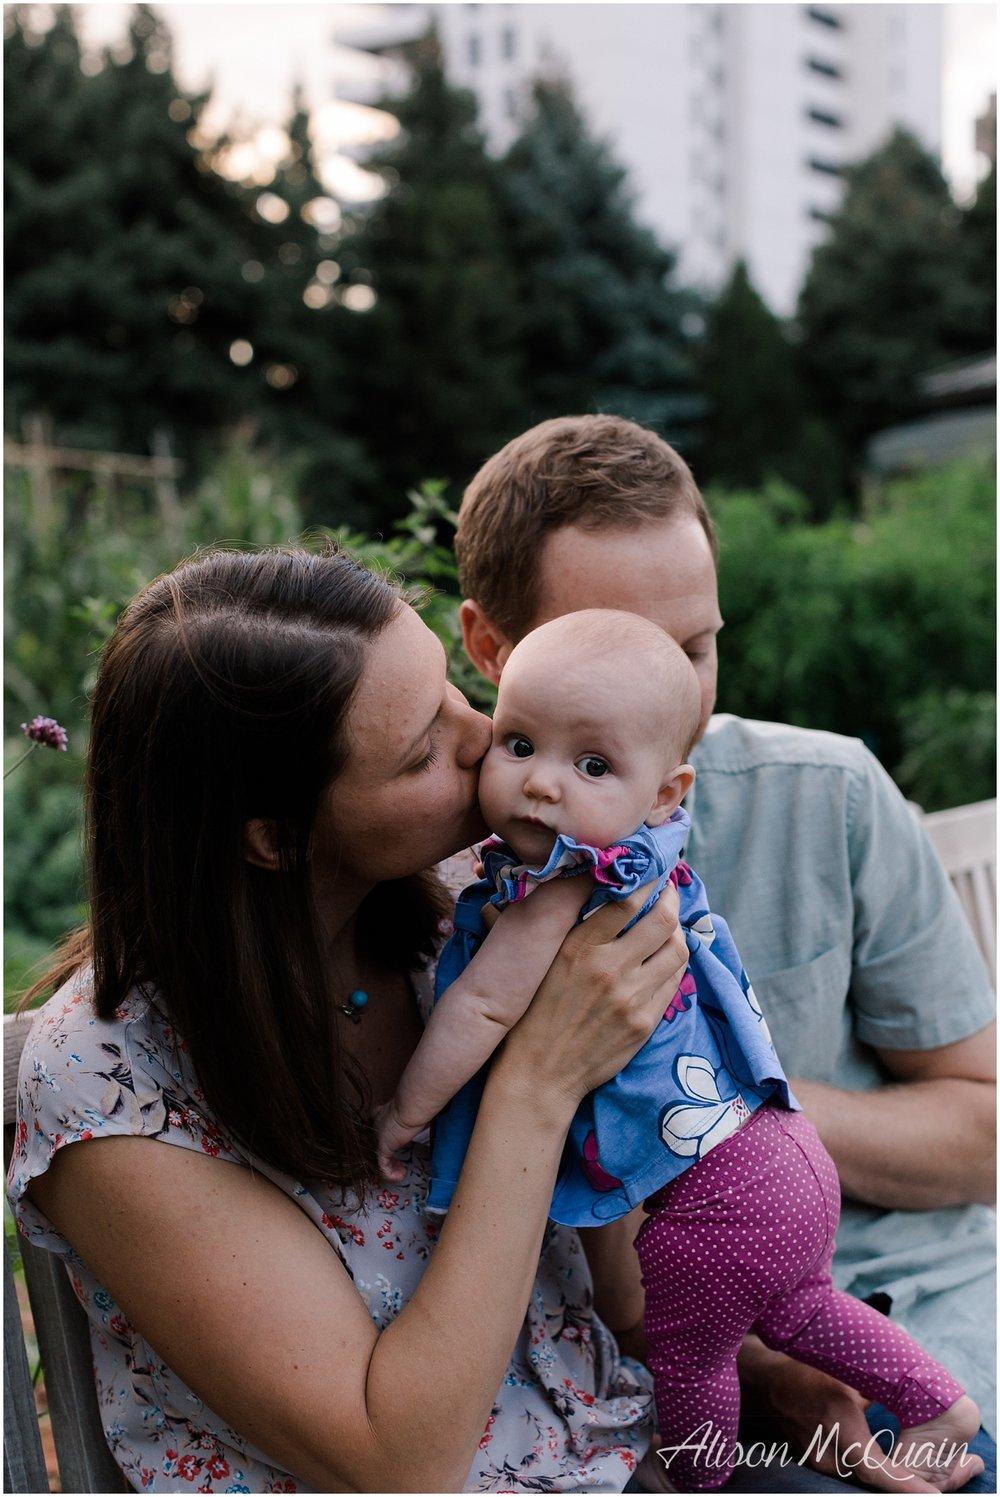 Claire_DenverBotanicGarden_Family_foreveryseason_AMPhoto_Aug2018_0030.jpg